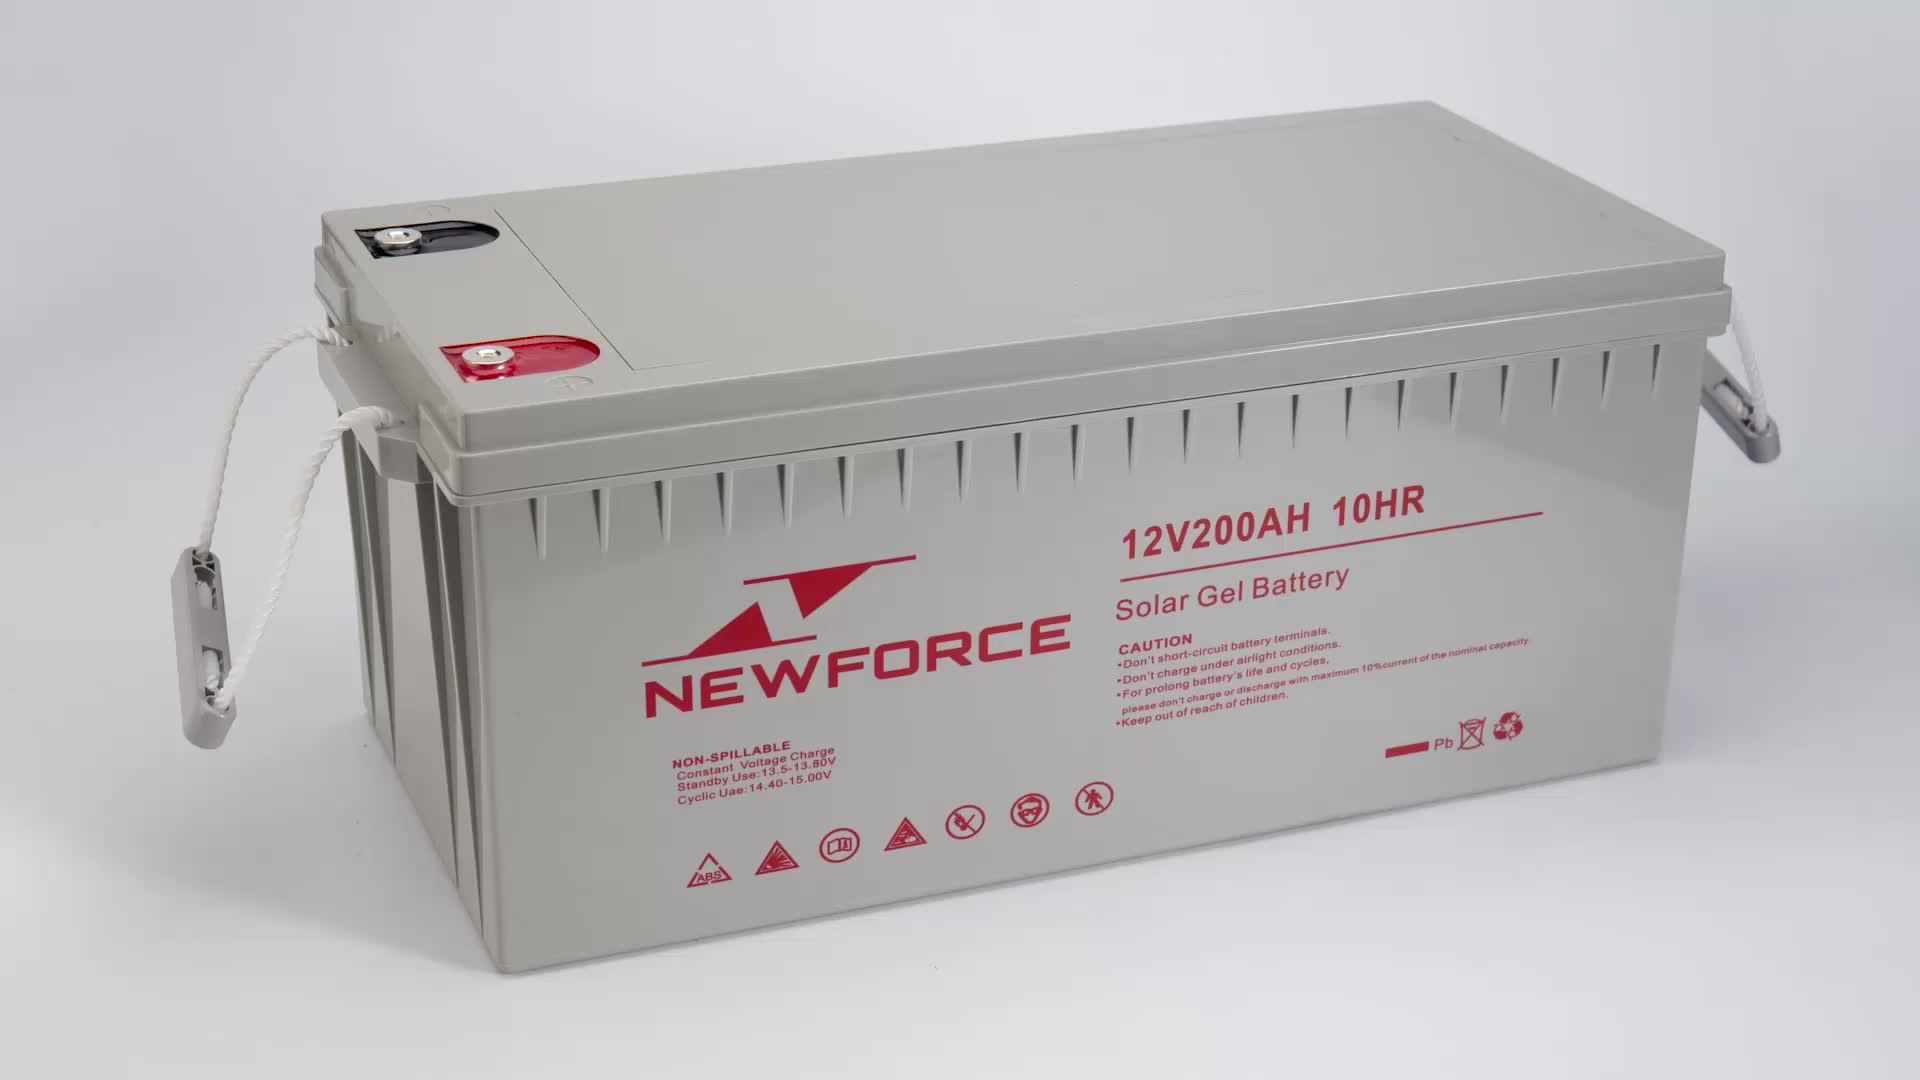 Bateria de alta capacidade gel 12v 300ah 12v 300ah de bateria solar de armazenamento de energia solar